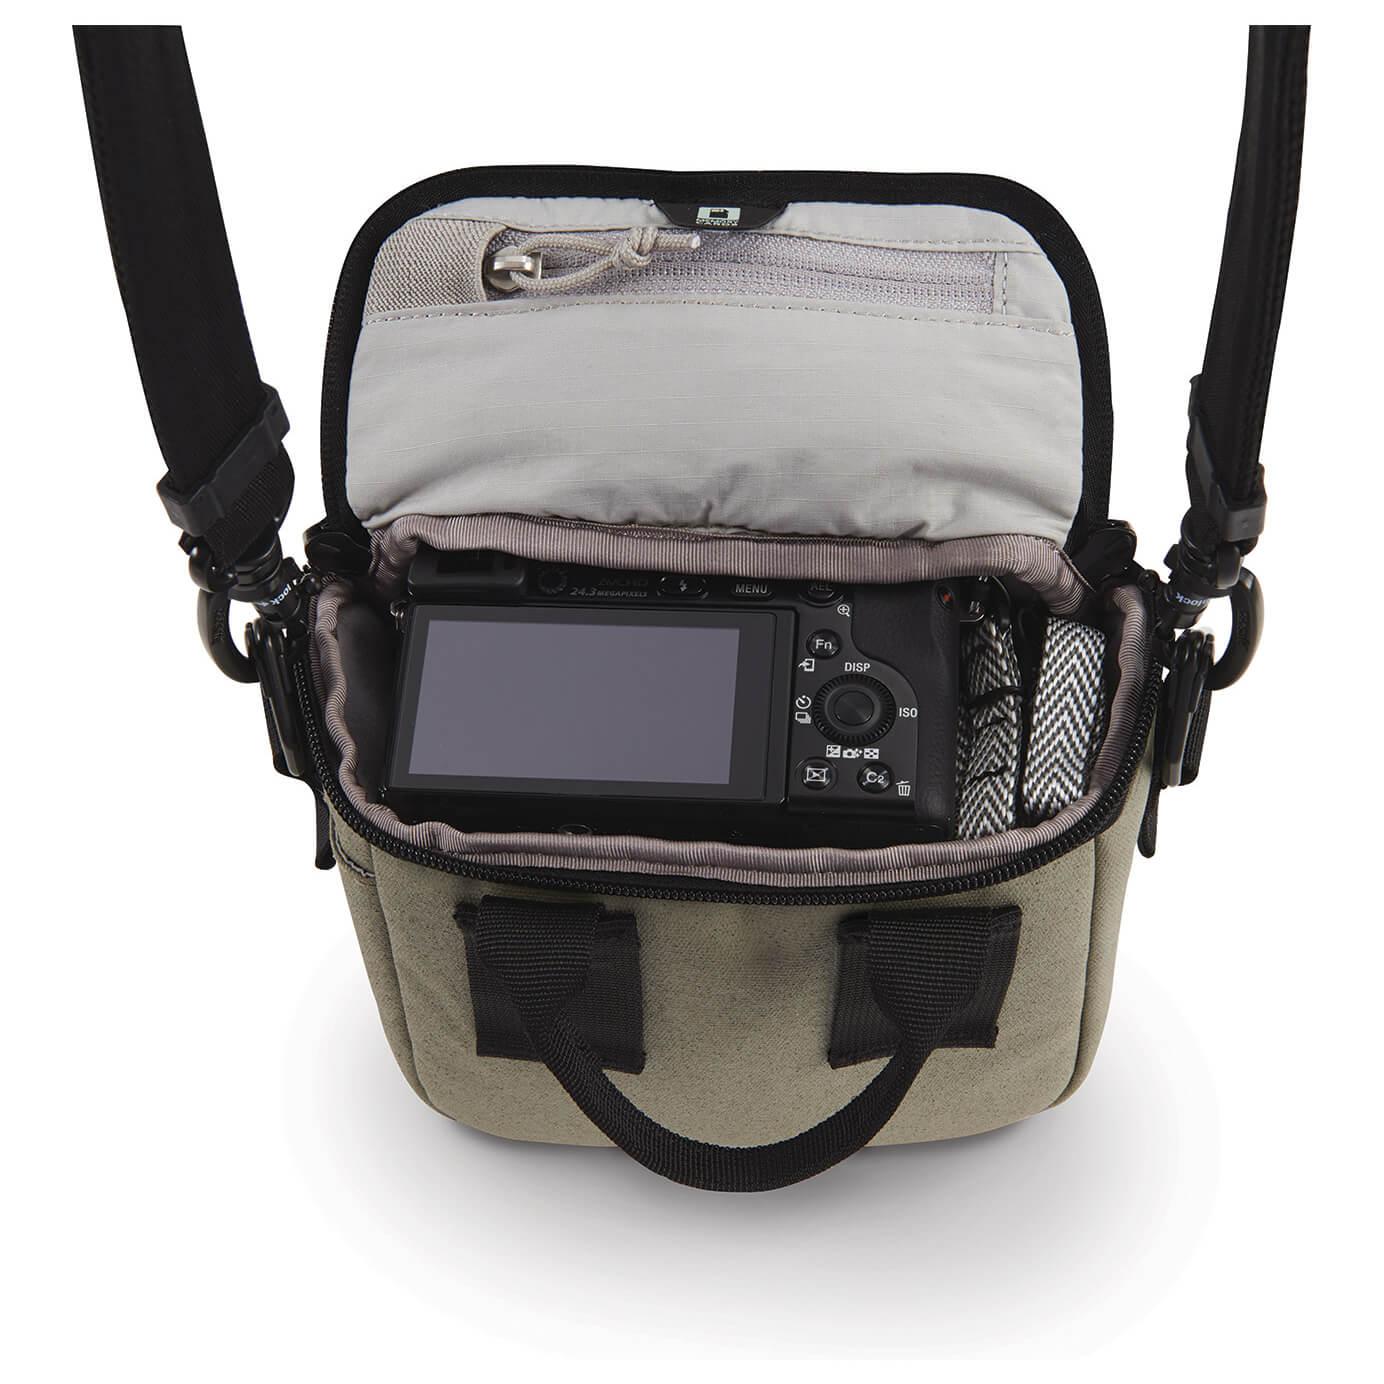 Pacsafe Camsafe Z2 Camera Bag Buy Online Alpinetrek